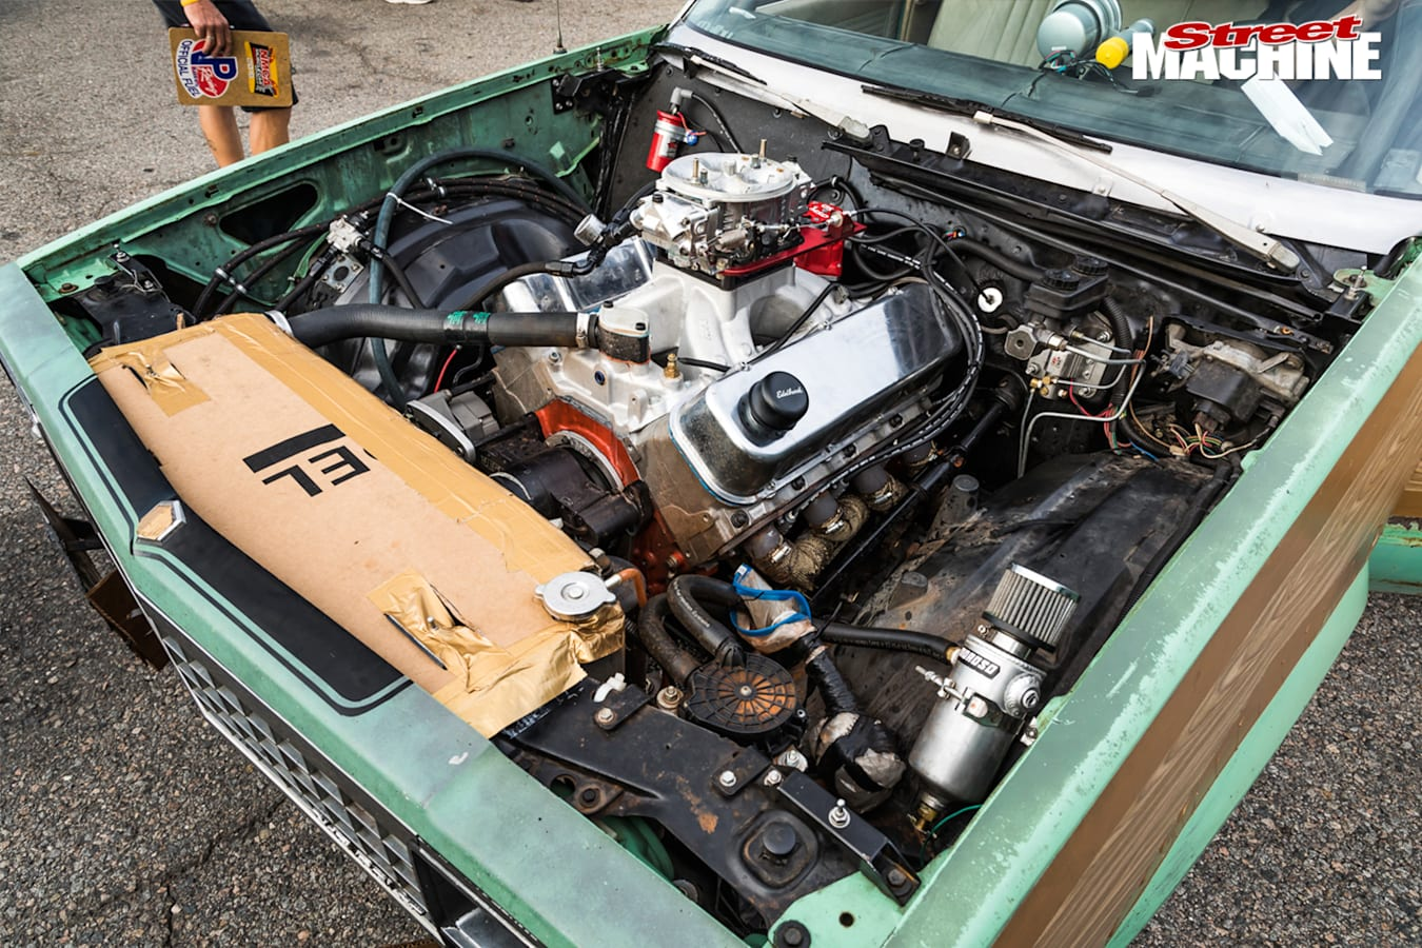 565ci big block chevy malibu engine bay